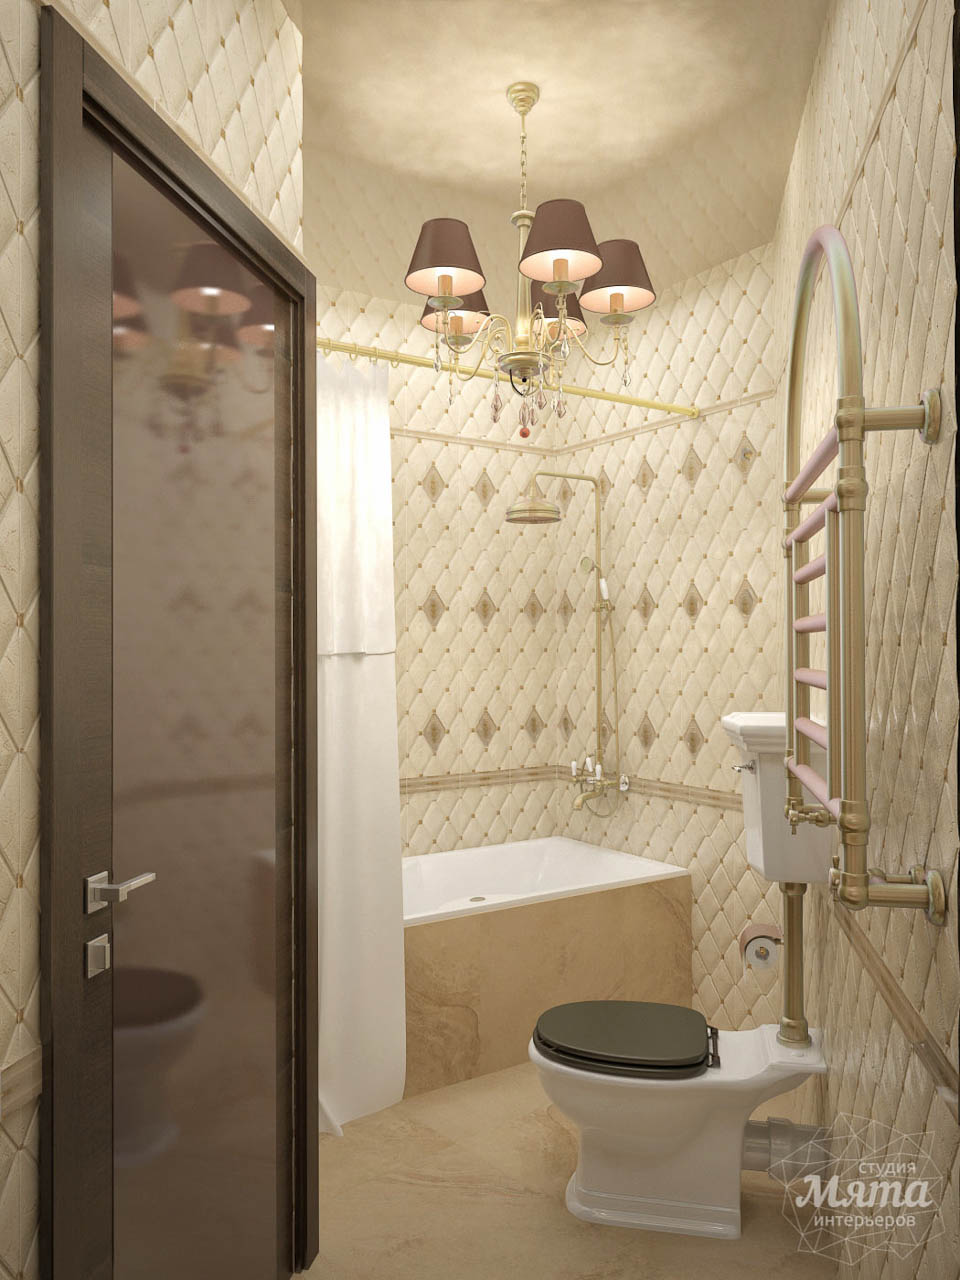 Дизайн интерьера и ремонт трехкомнатной квартиры по ул. 8 Марта 190 img1541597219